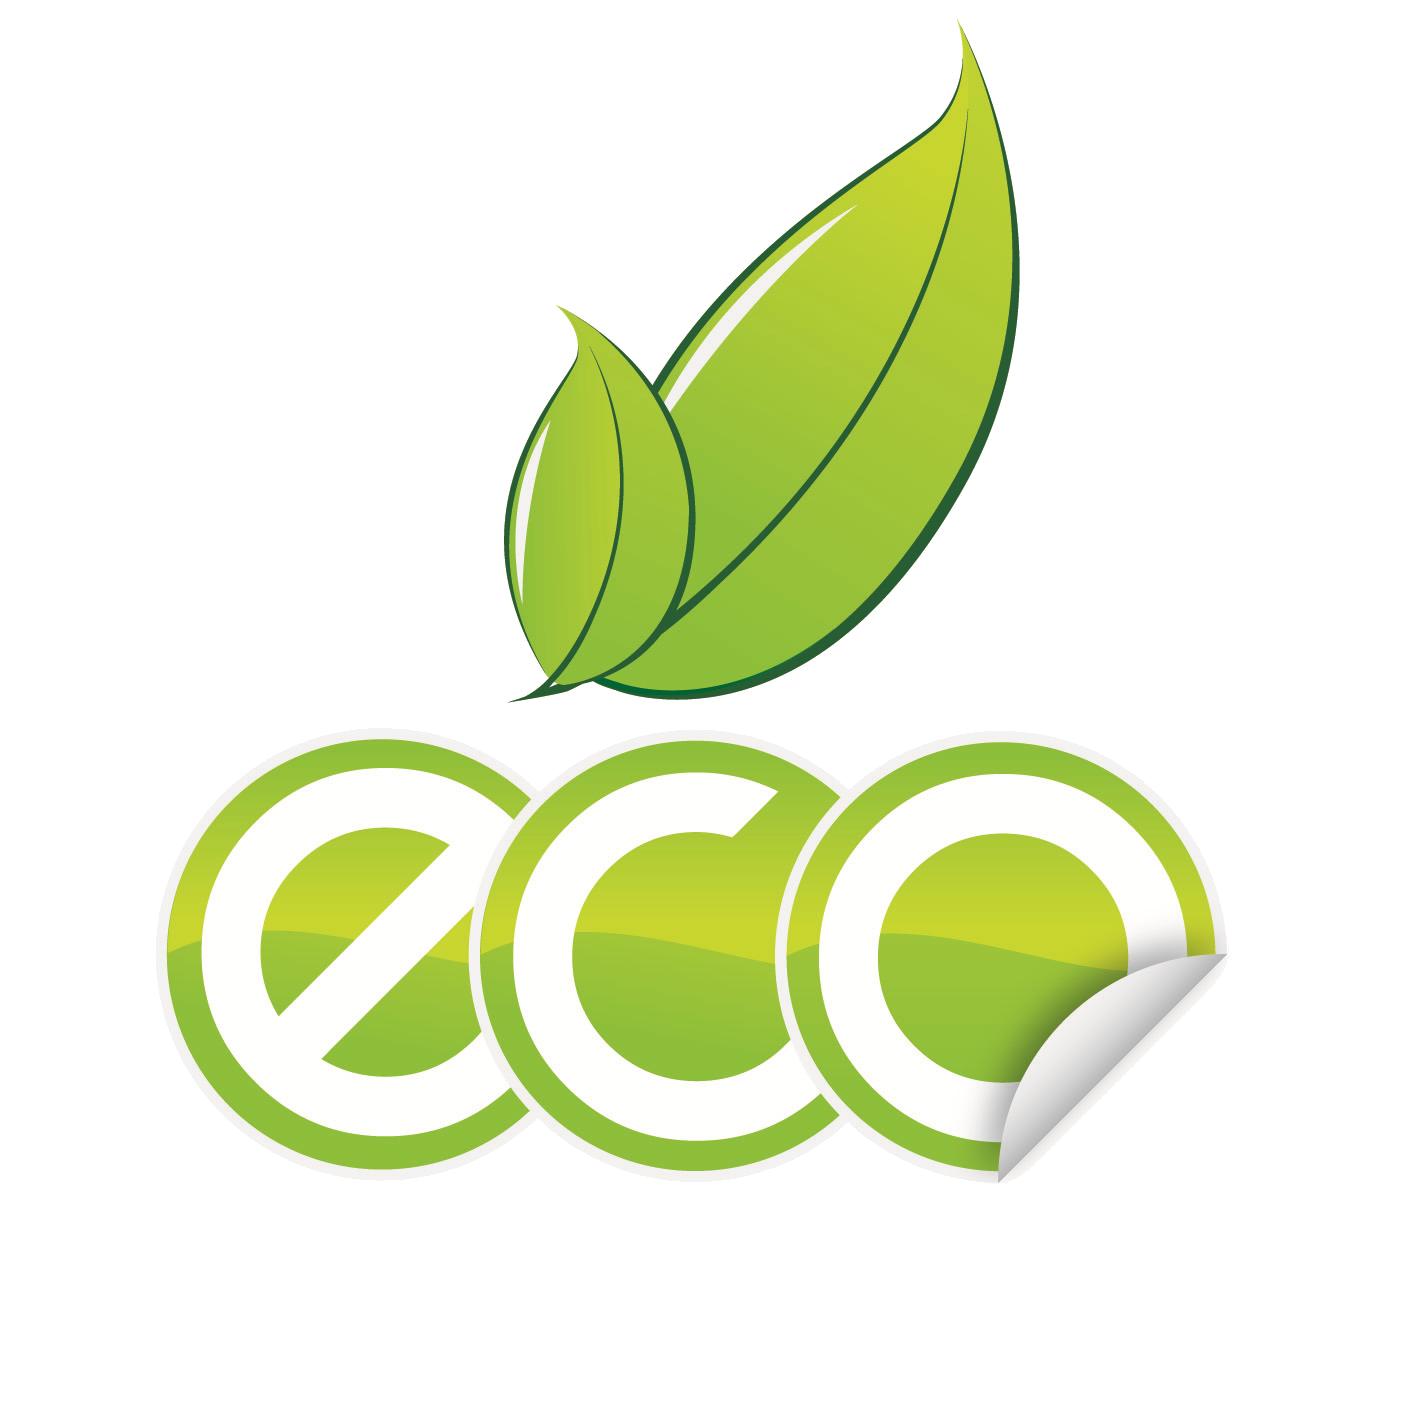 ECO Logo Wallpaper